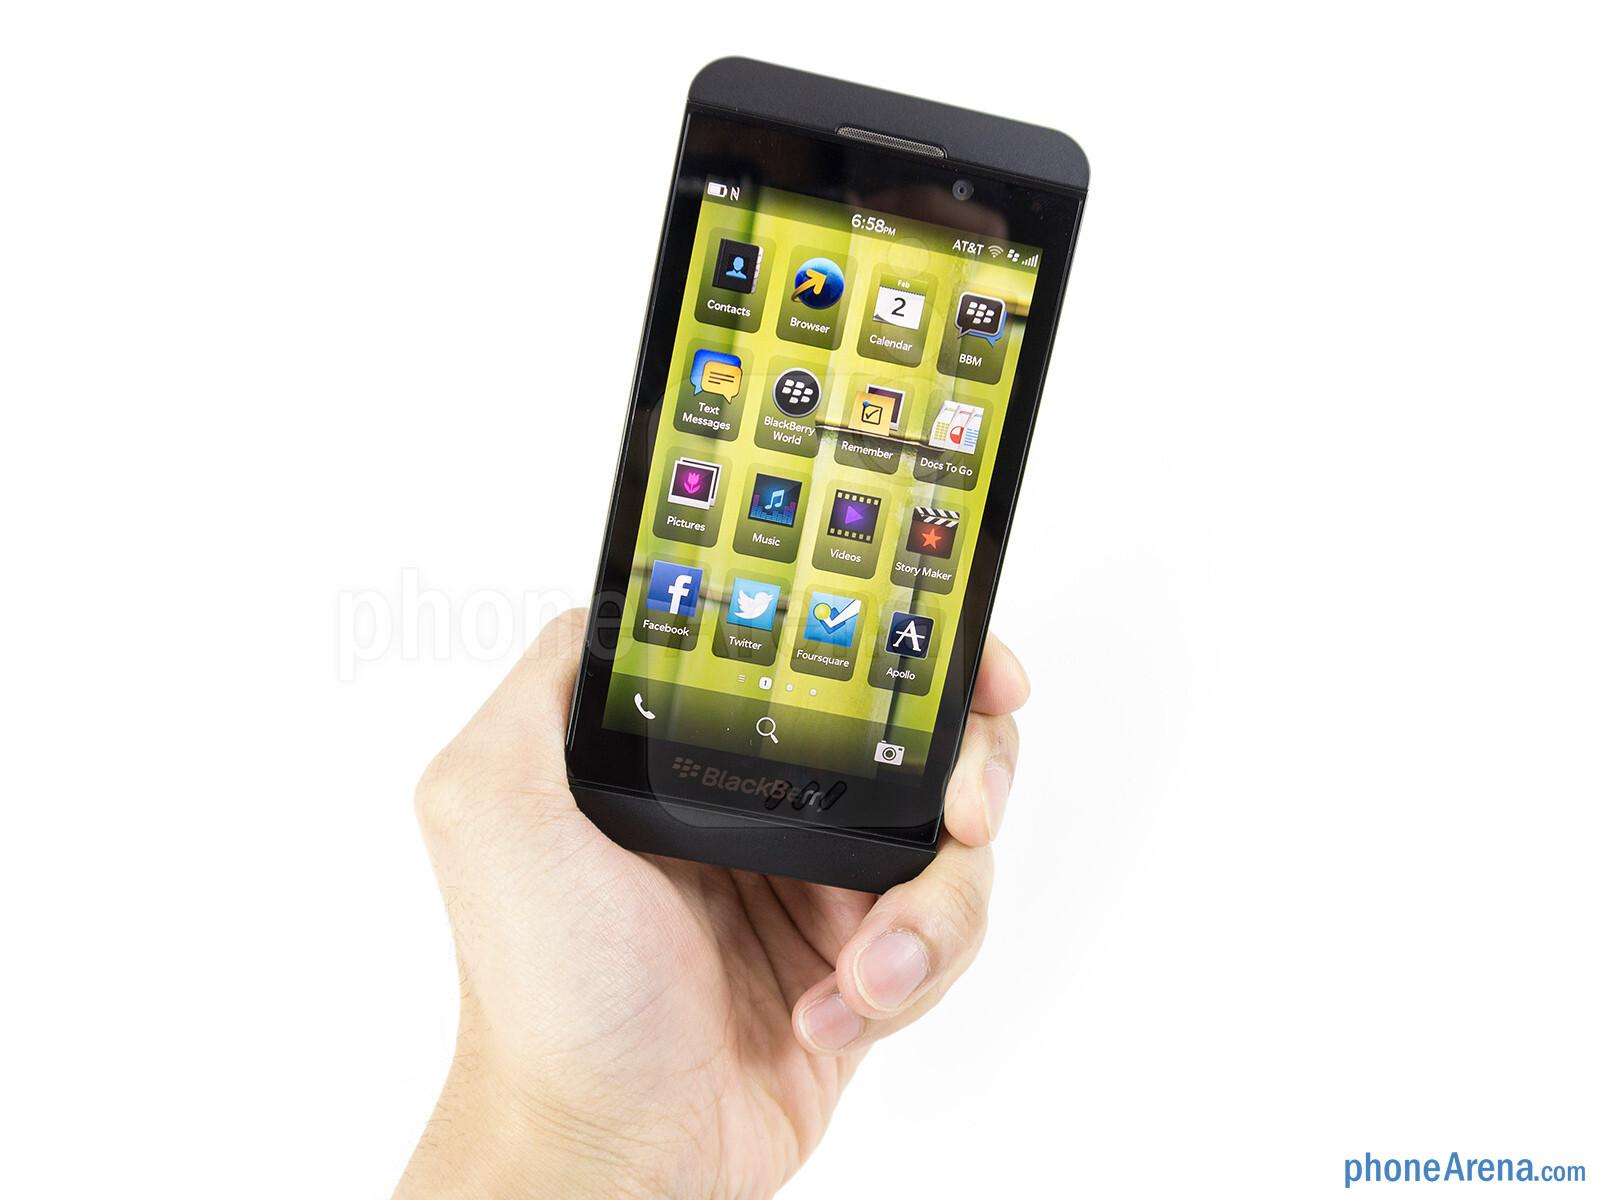 BlackBerry-Z10-Review-003.jpg